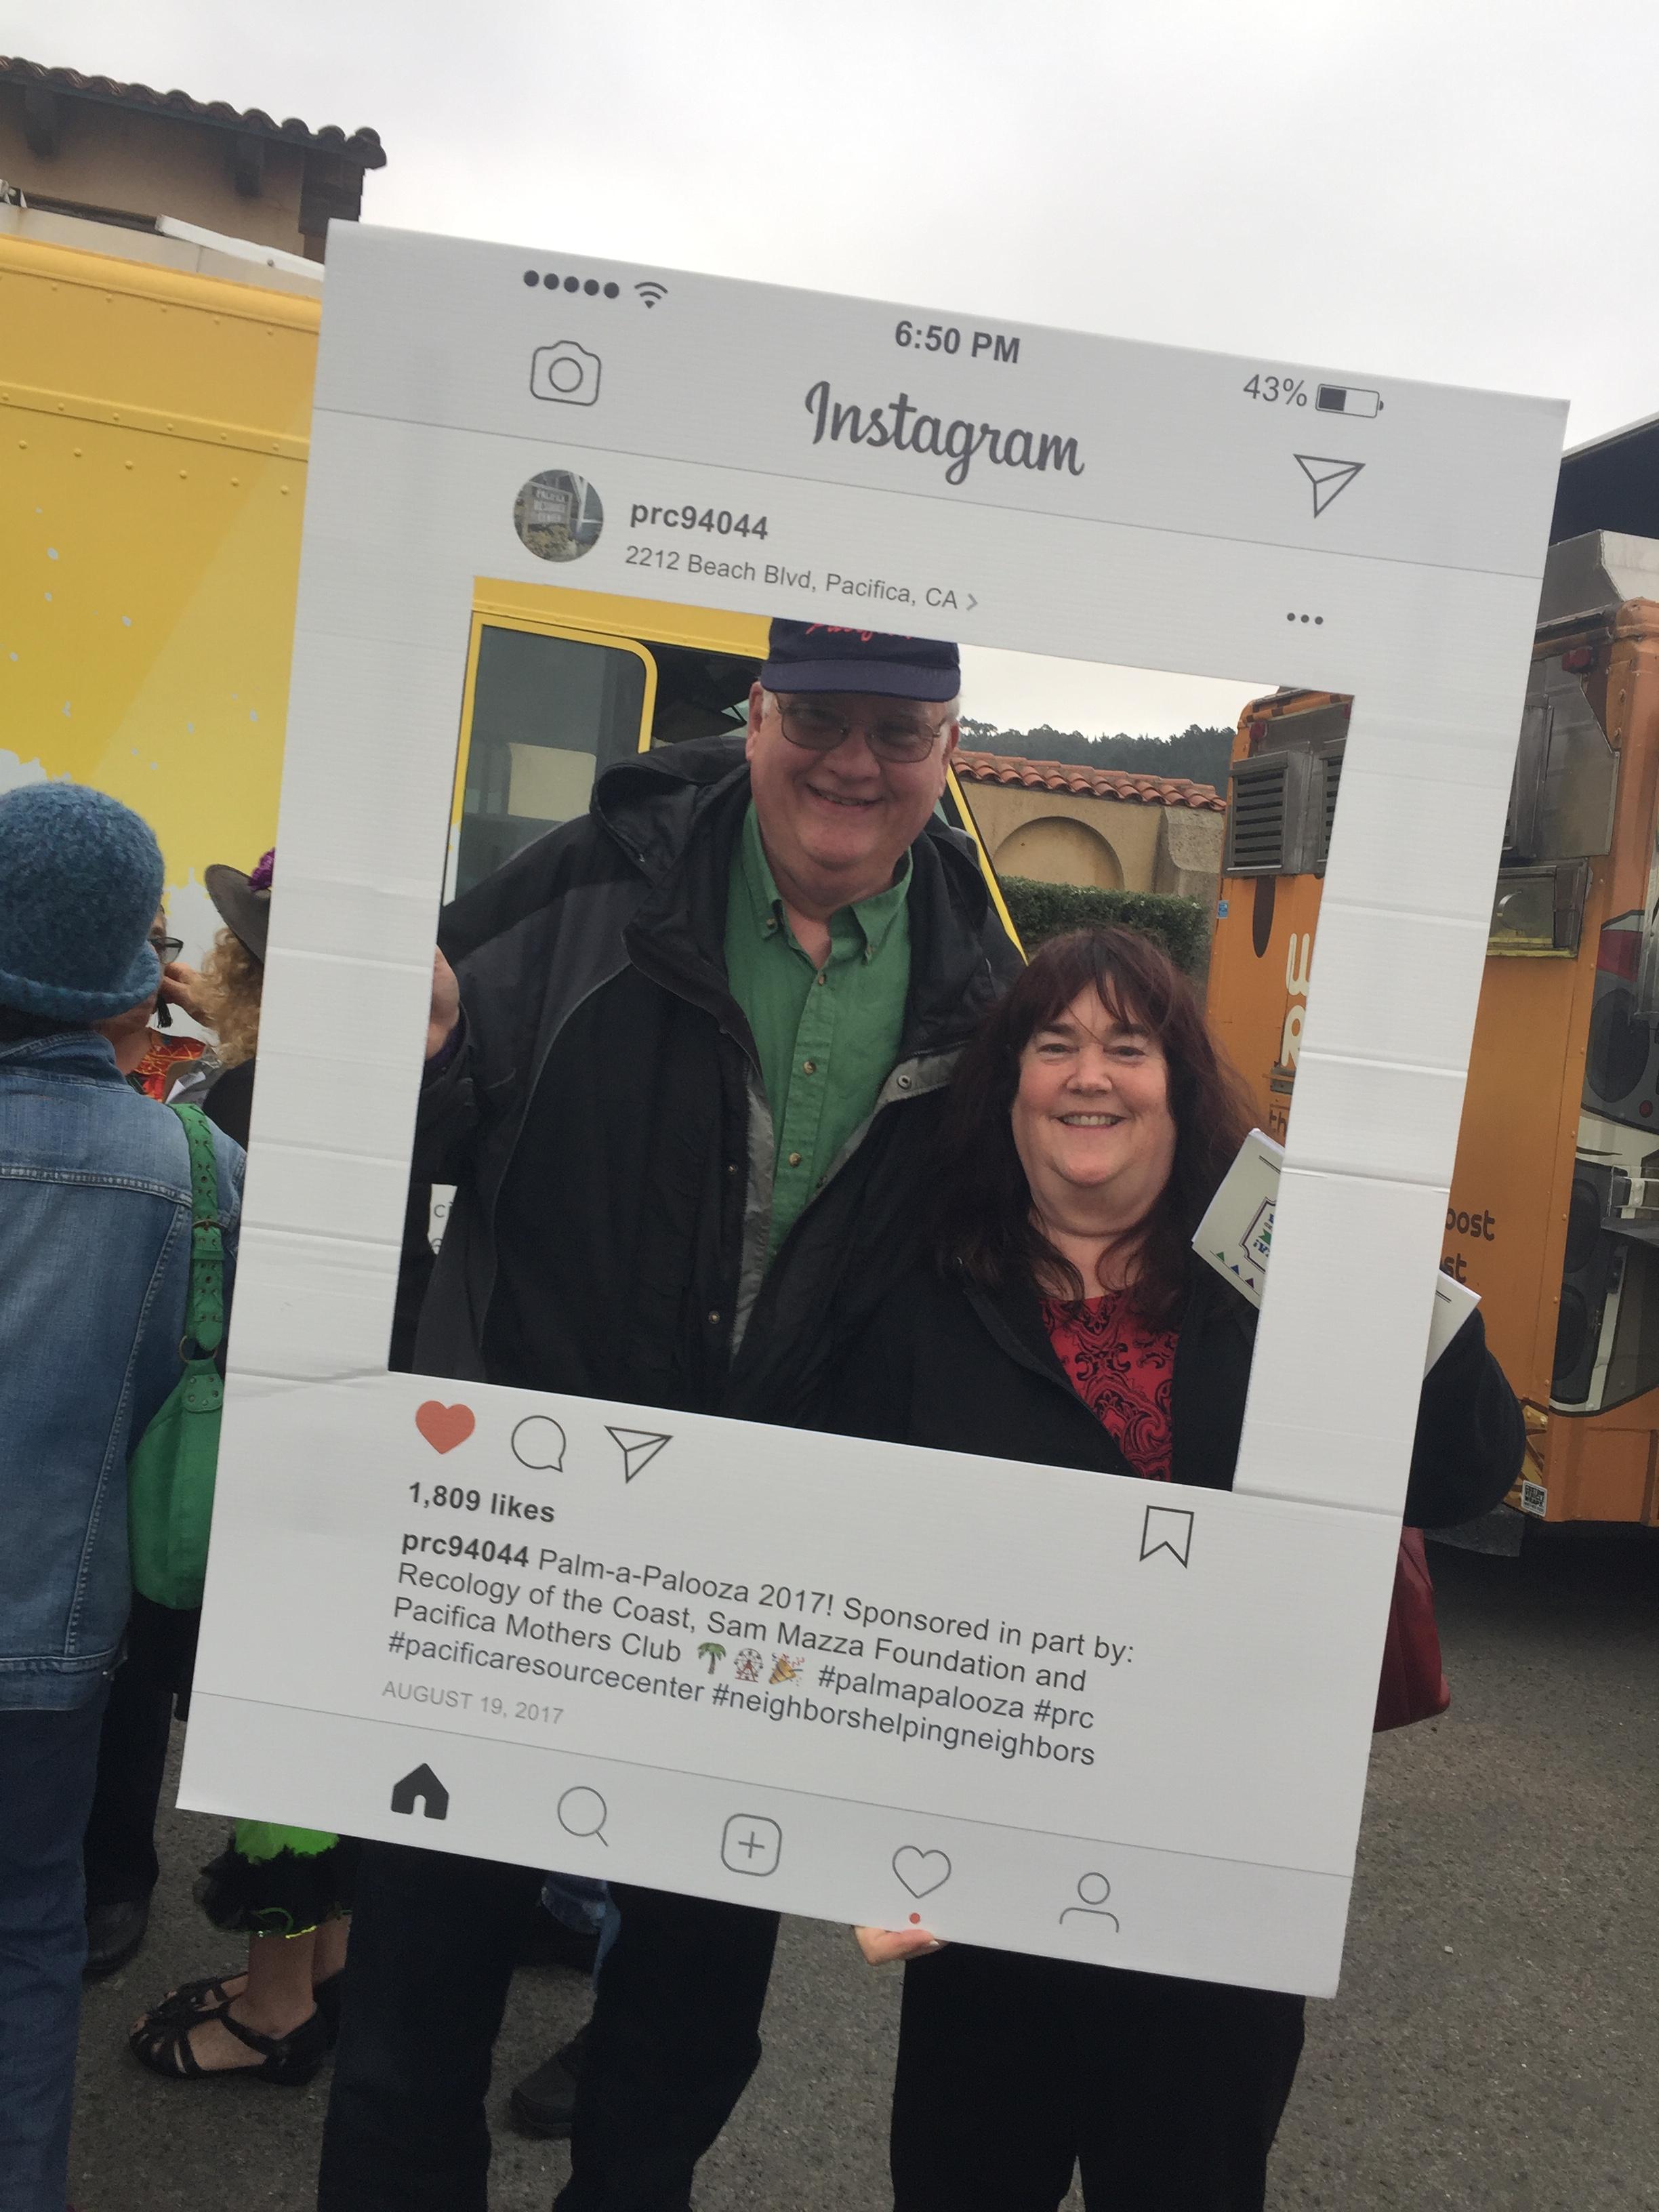 Mayor Mike O'Neill and Councilwoman Sue Vaterlaus - Copy - Copy.JPG